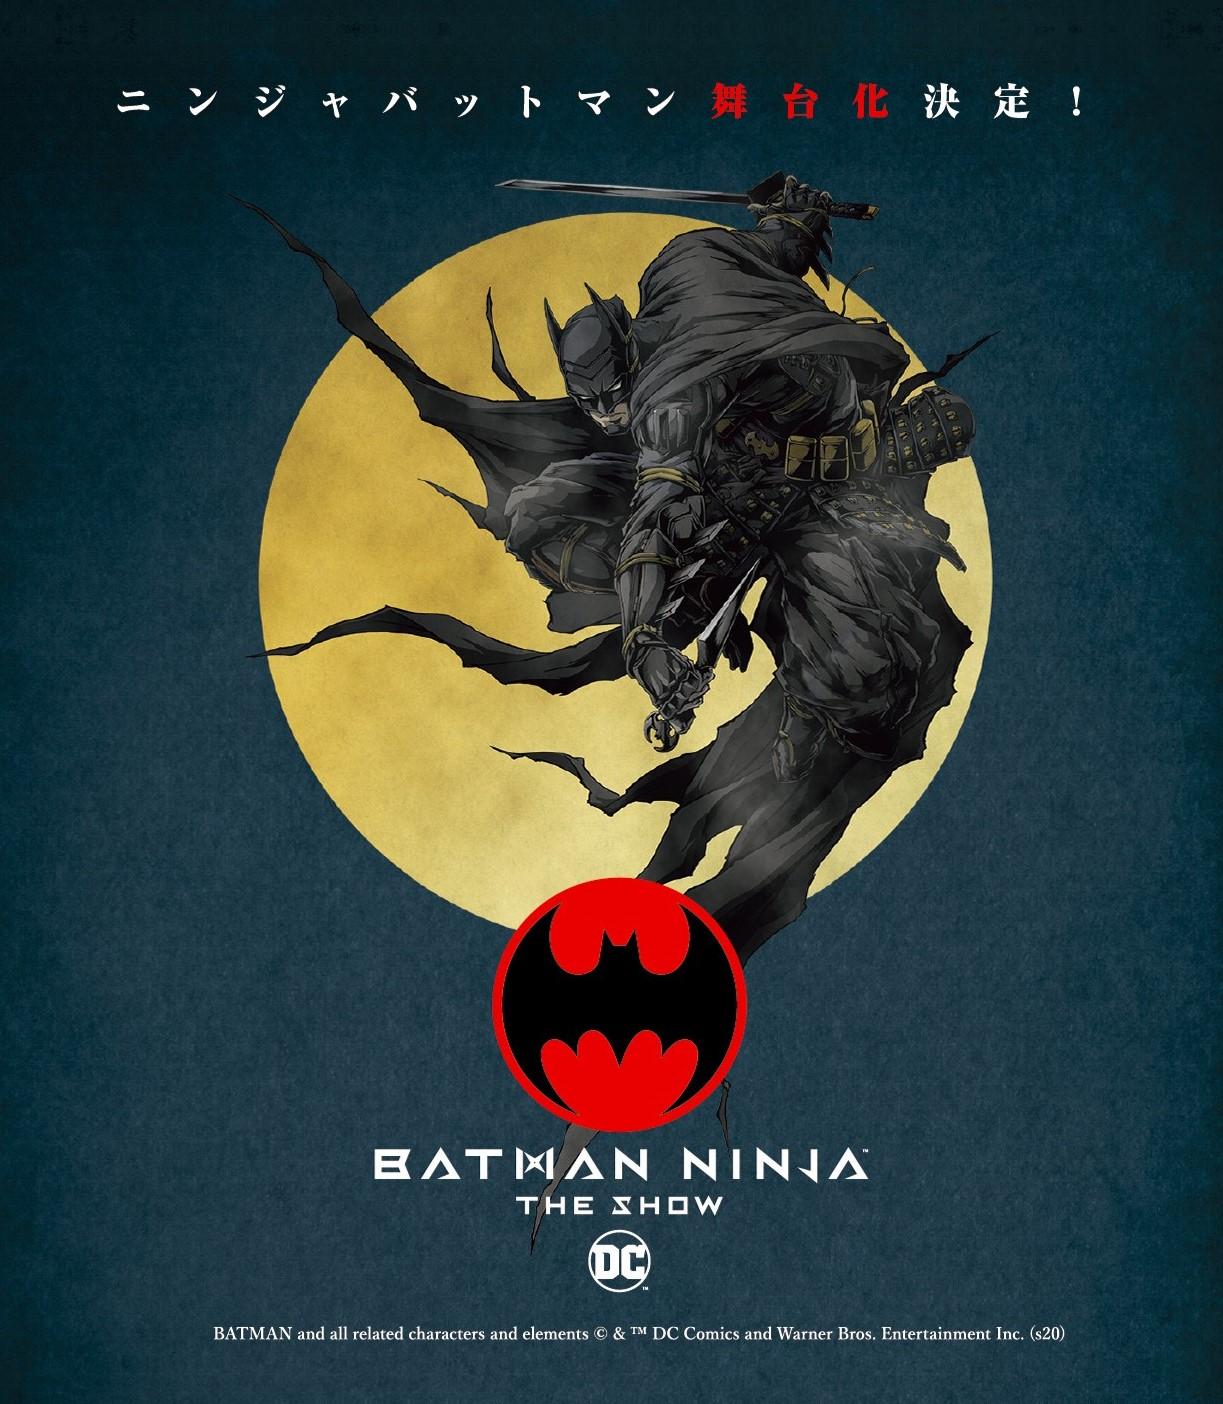 BATMAN NINJAーTHE SHOW(ニンジャバットマン ザ・ショー)